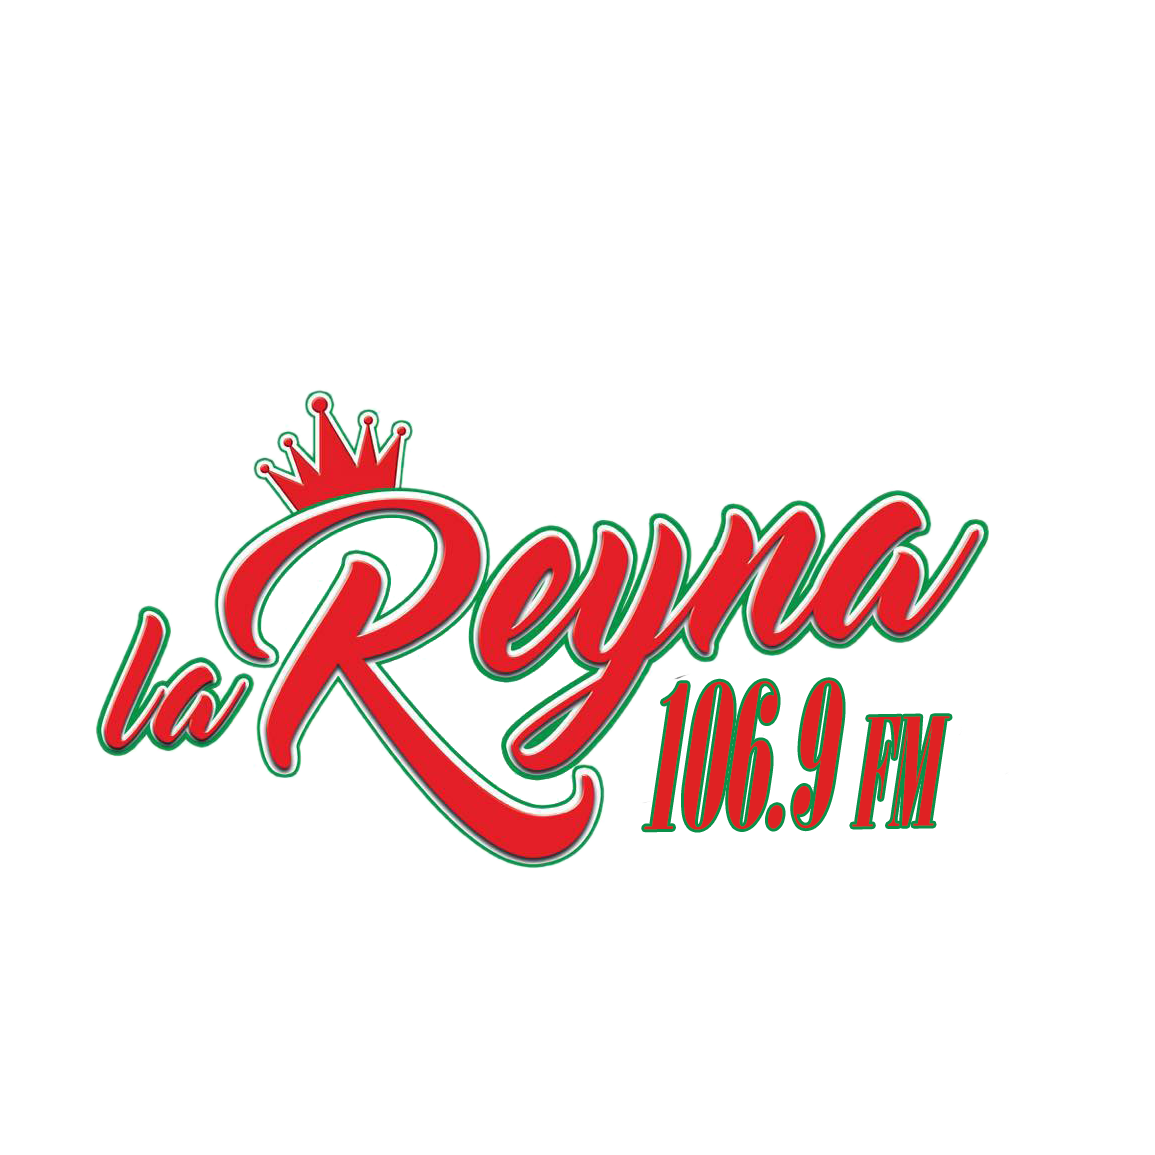 106.9 La Reyna